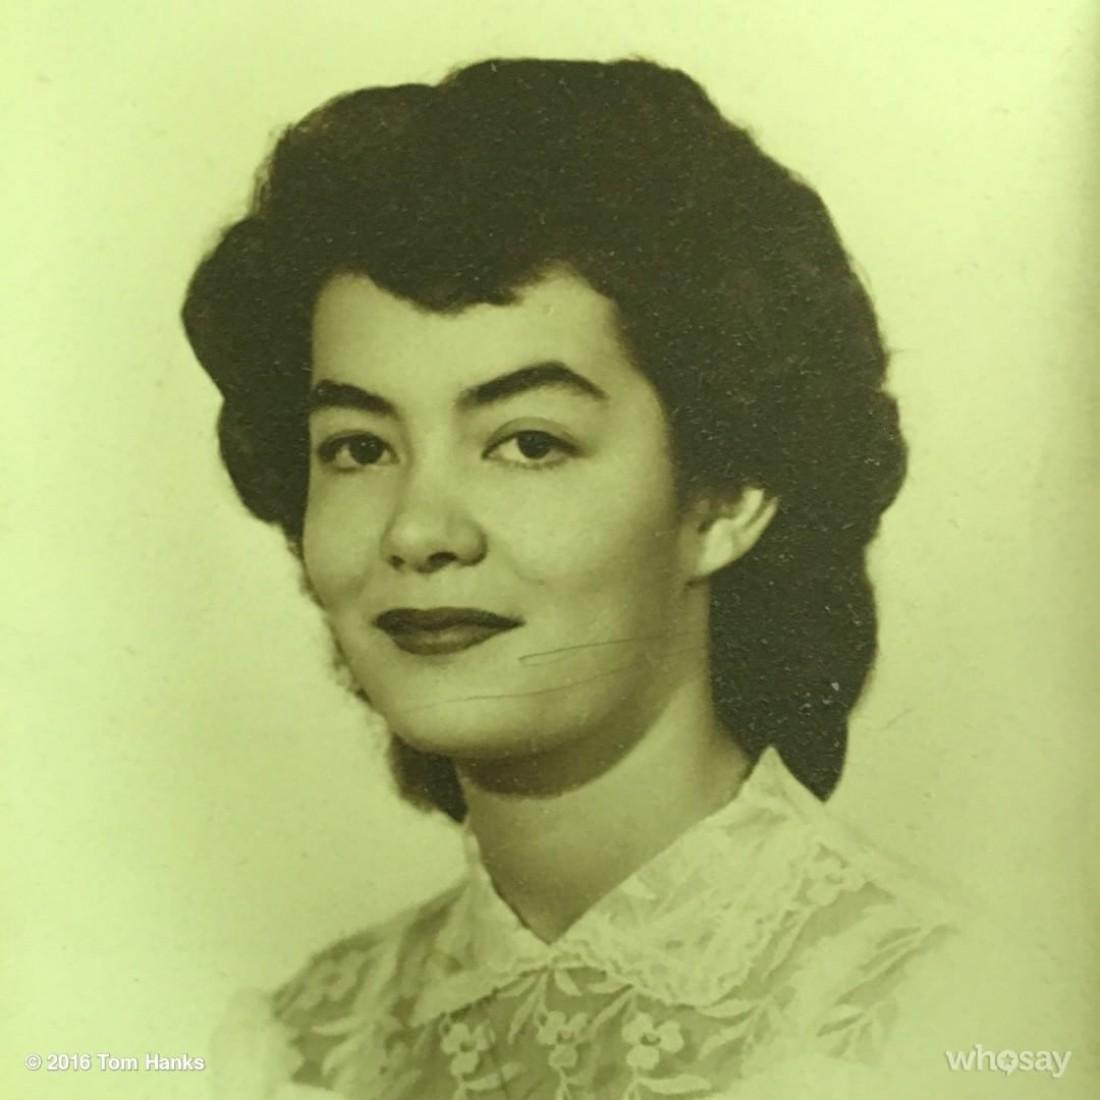 Мама Хэнкса – Джанет Мерилин Фрагер